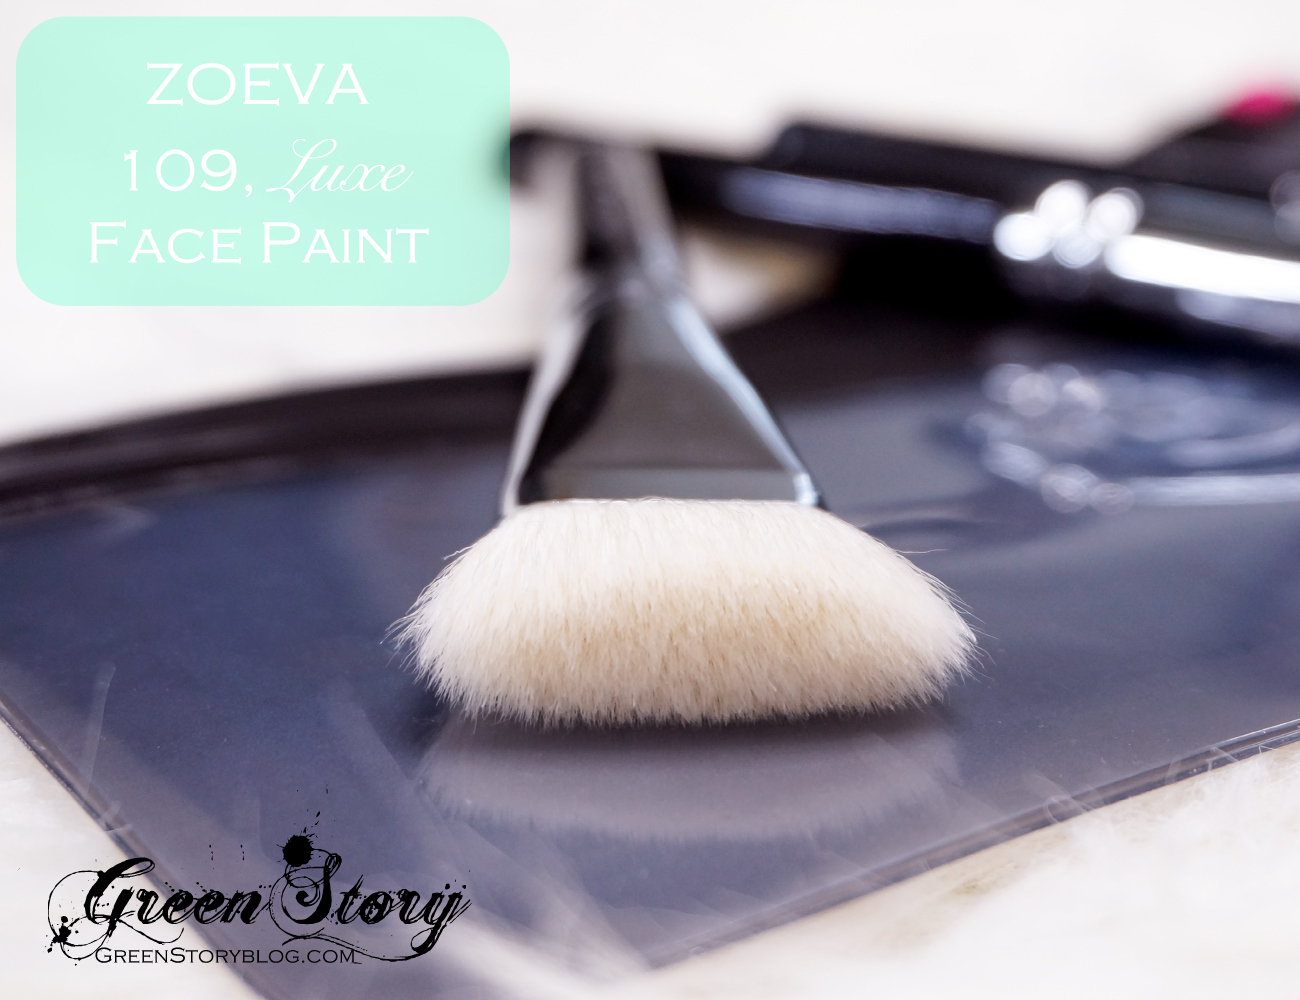 Zoeva 109 Luxe Face Paint